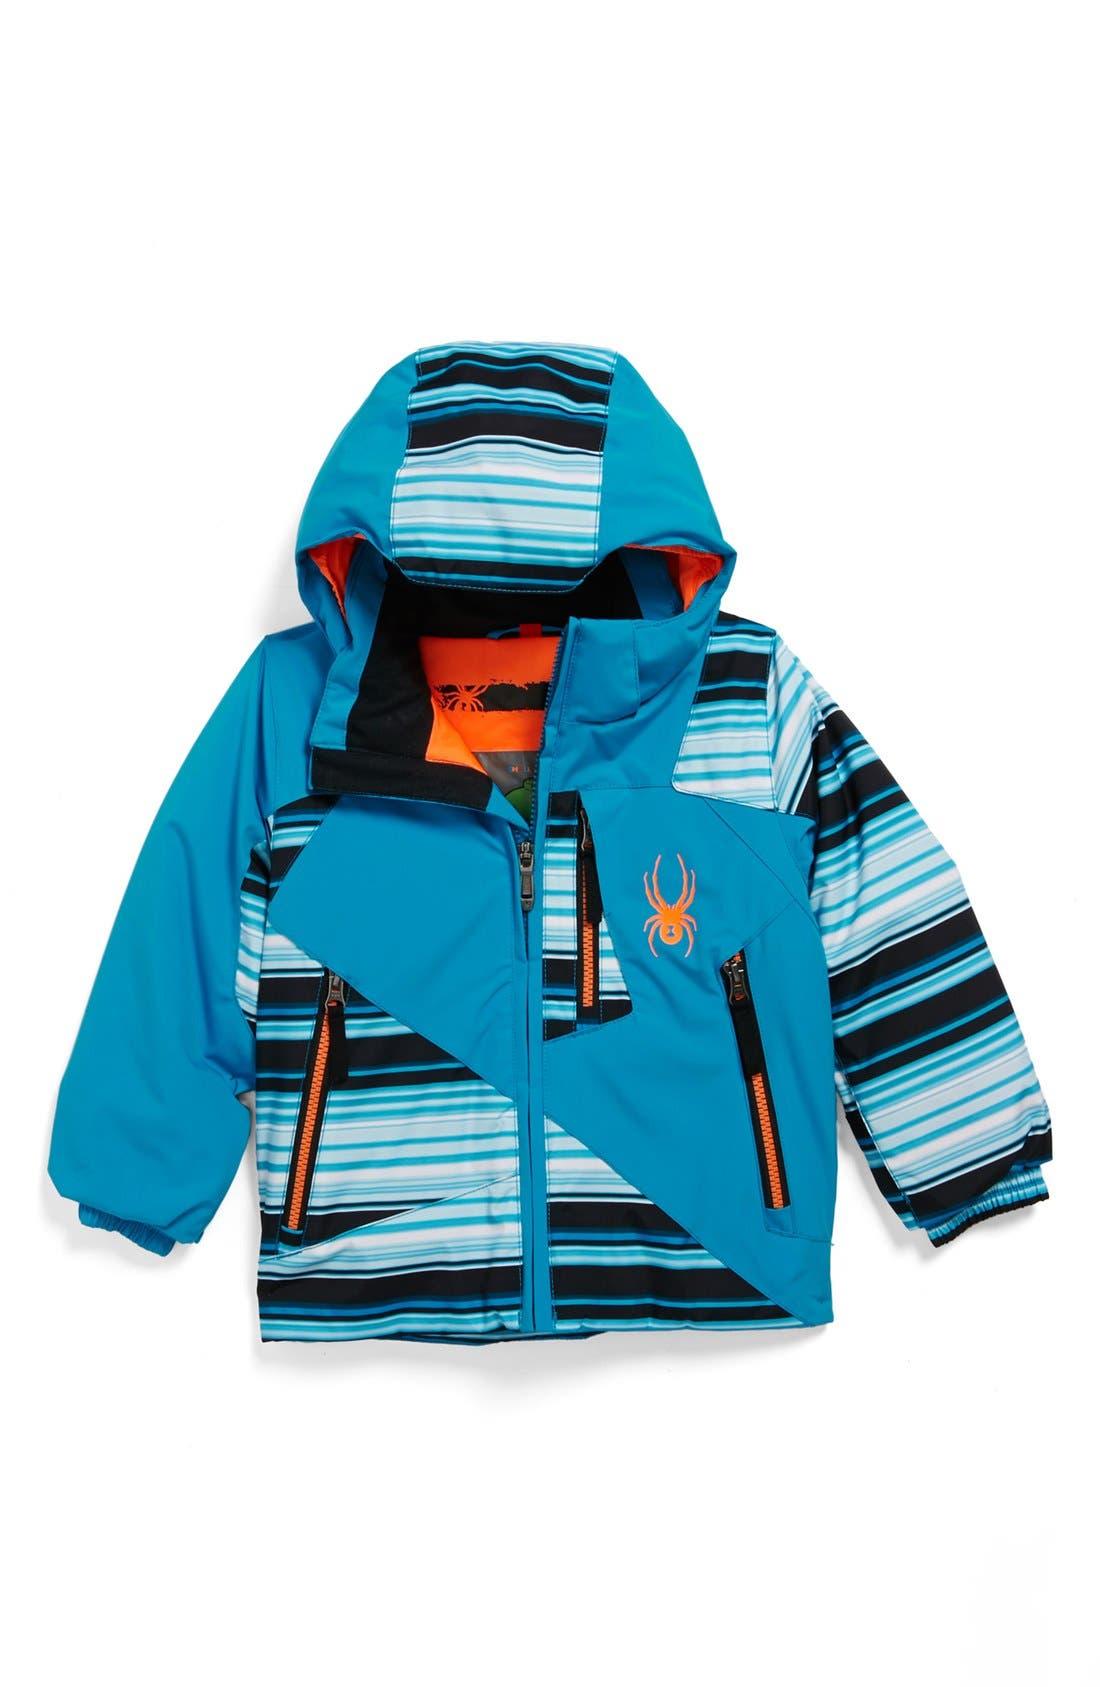 Main Image - Spyder 'Armageddon' Waterproof Snow Jacket (Little Boys)